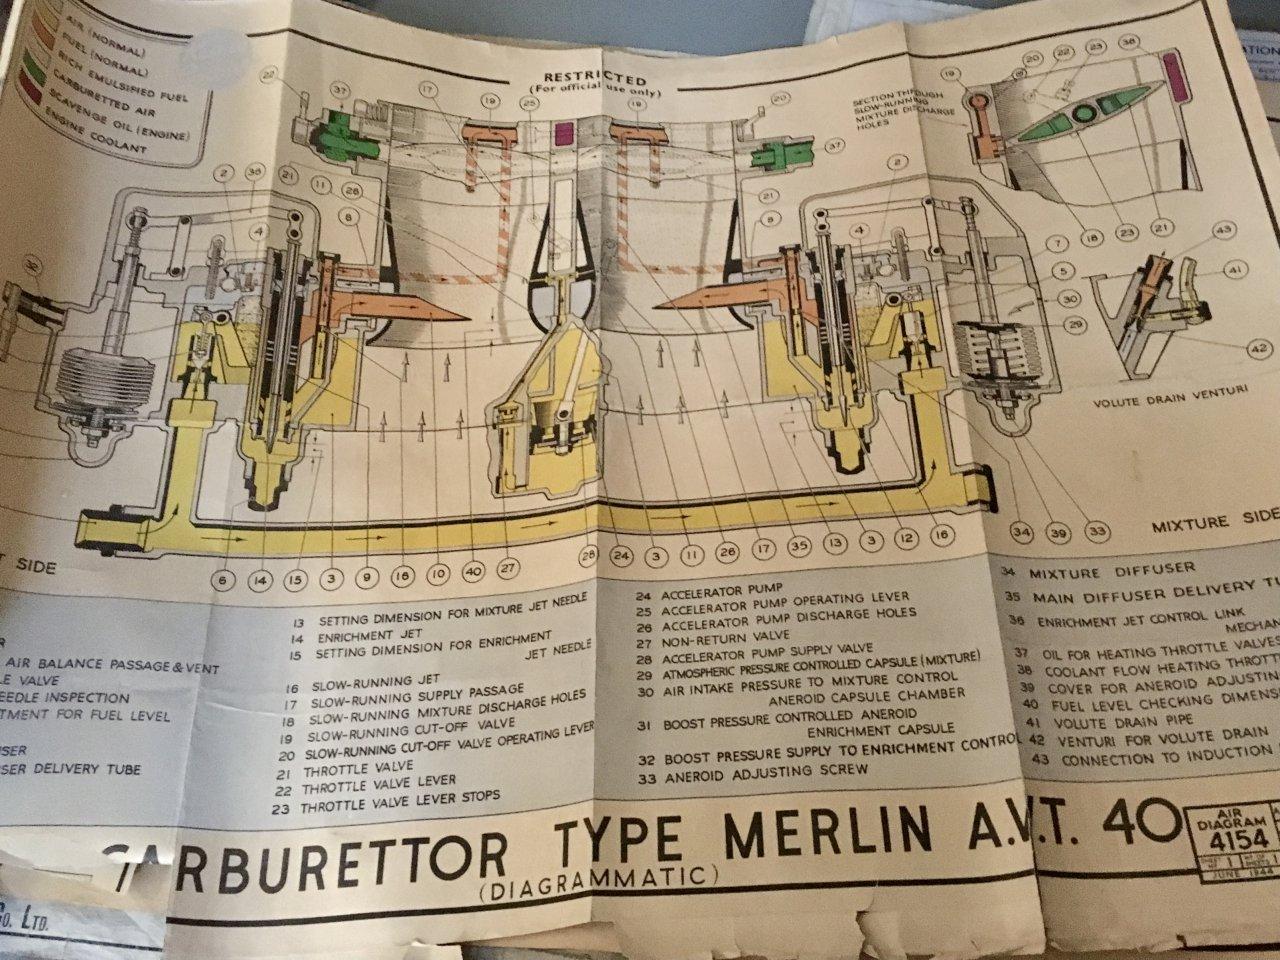 Spitfire, Spitfire (replica) flies in front of carburetor producer's plant, ClassicCars.com Journal